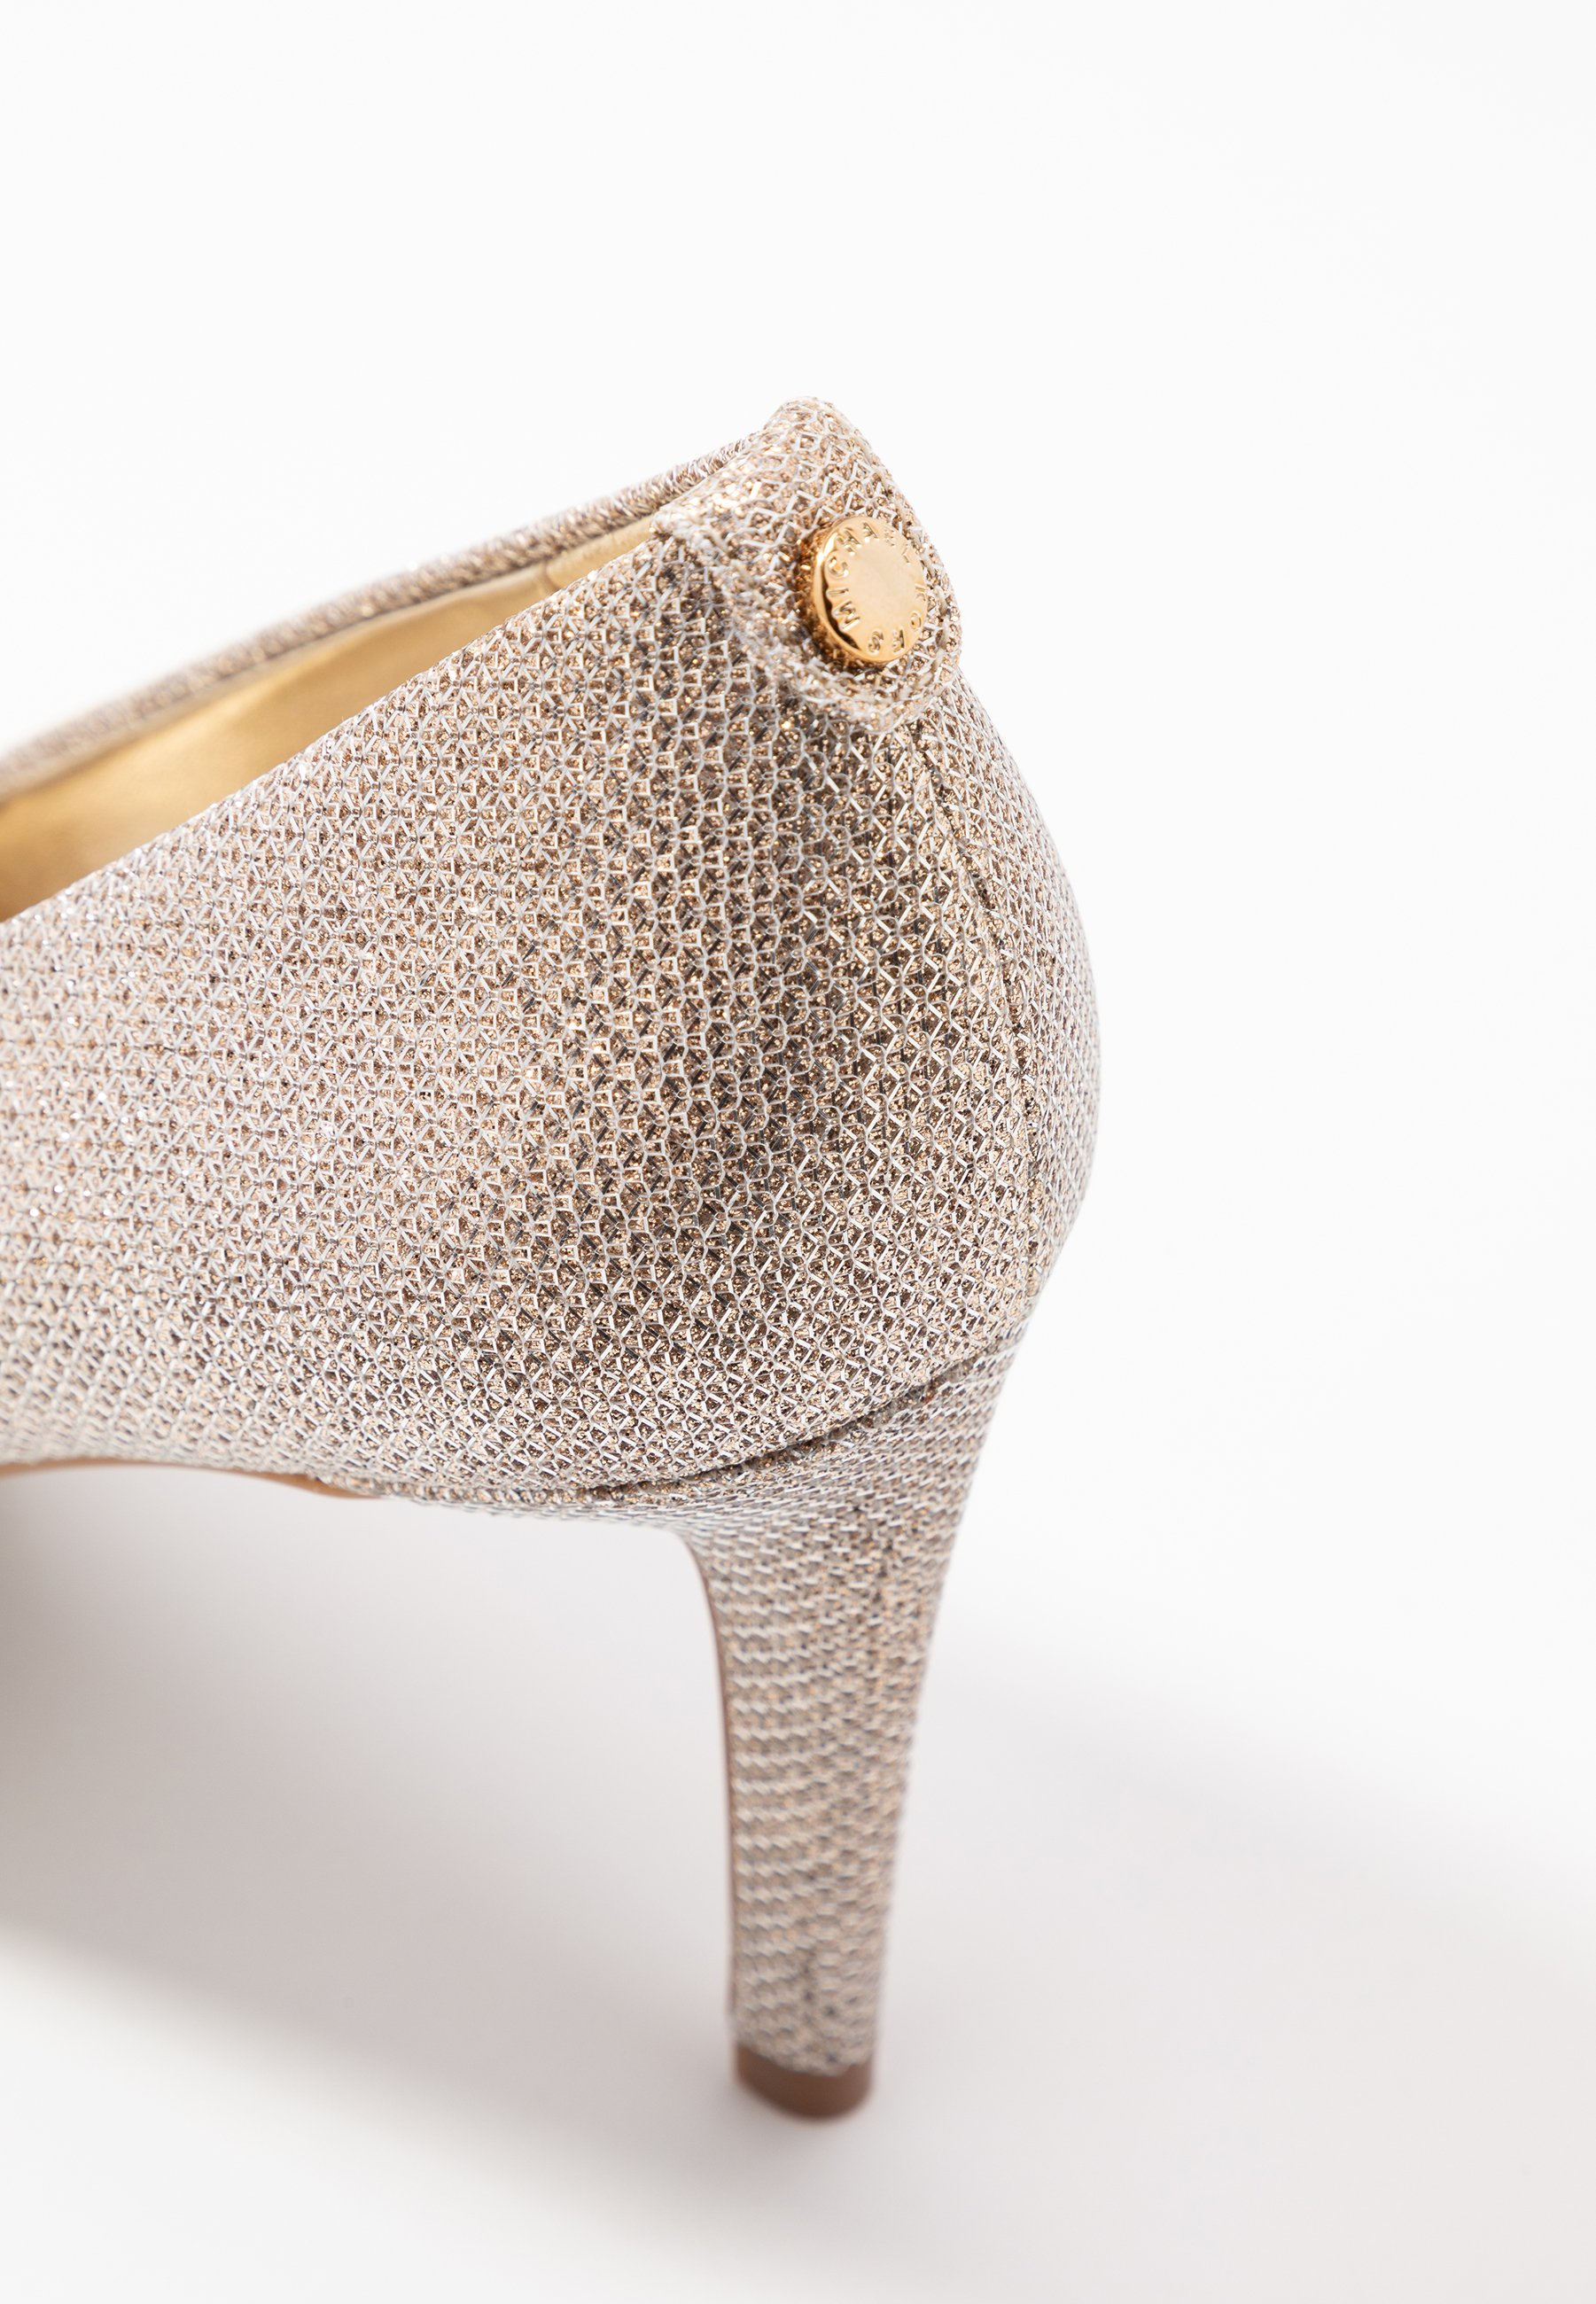 Big Sale Fashionable Women's Shoes MICHAEL Michael Kors DOROTHY FLEX  Classic heels pale gold UhQFYg86D 9u940c4tO